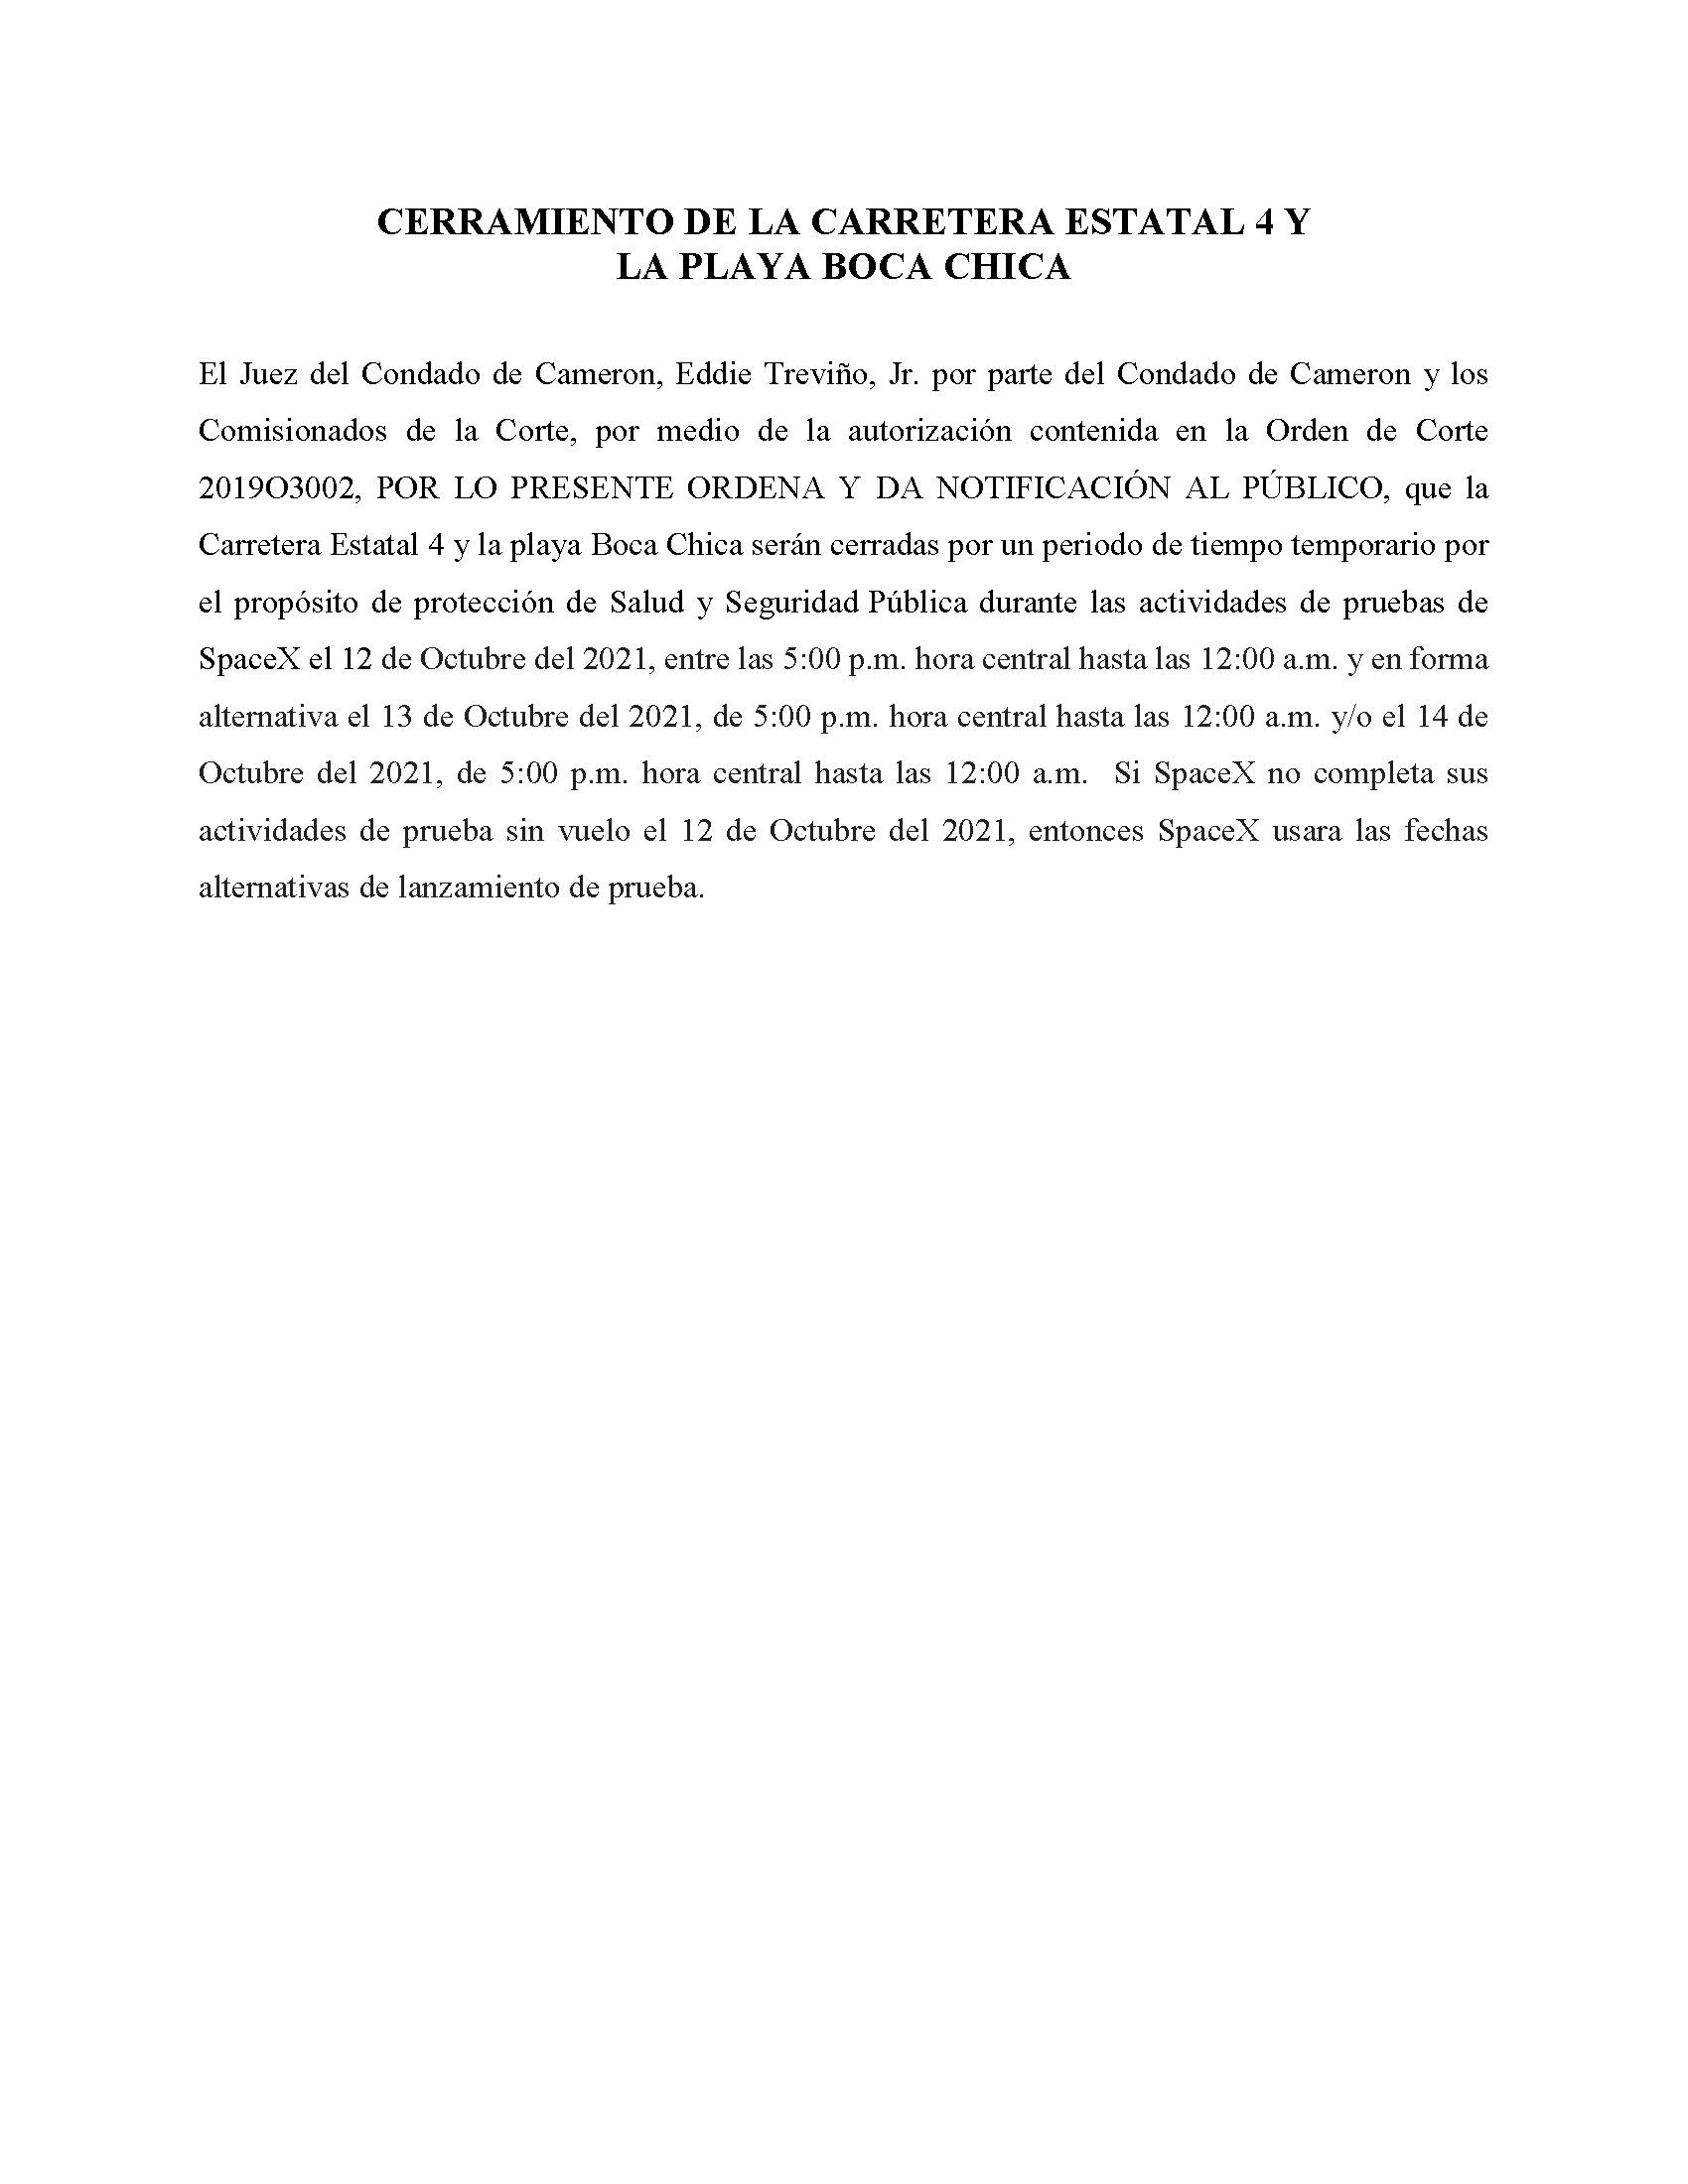 ORDER.CLOSURE OF HIGHWAY 4 Y LA PLAYA BOCA CHICA.SPANISH.10.12.2021